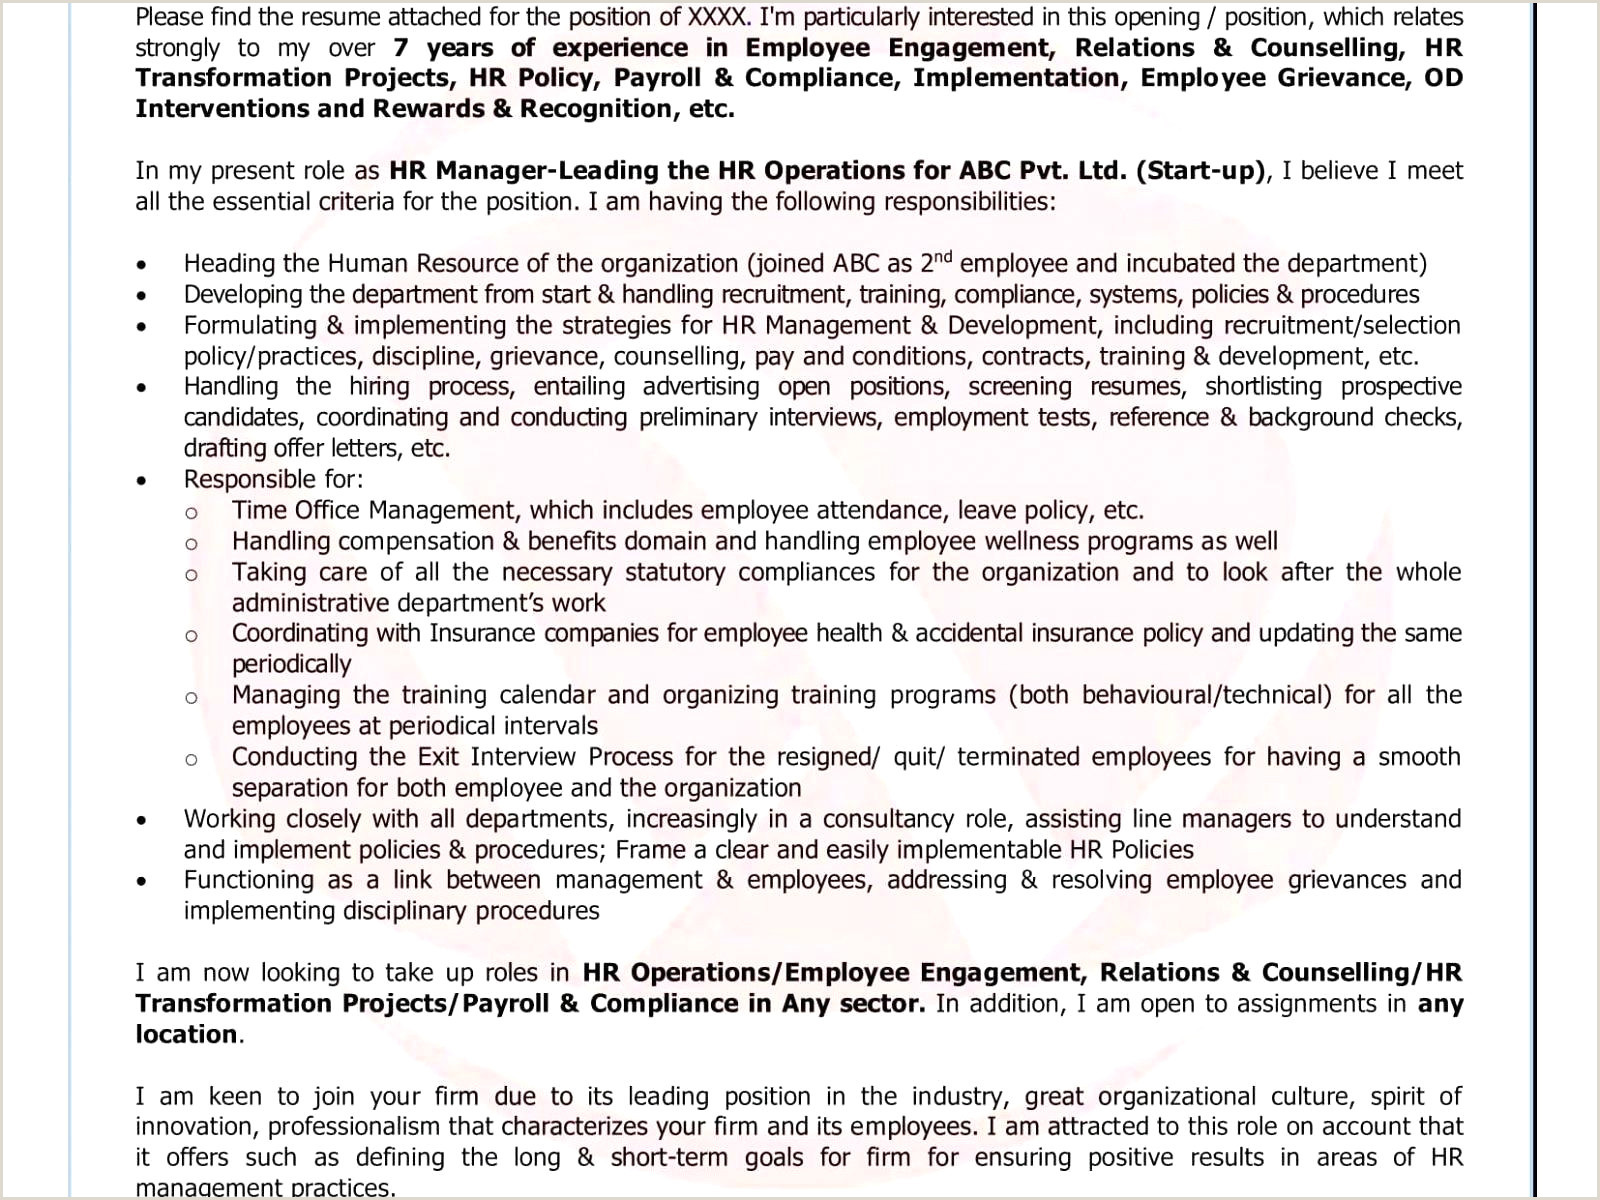 Resume Format For Job Easy Simple Job Resume Template Best Emt Resume Skills Examples